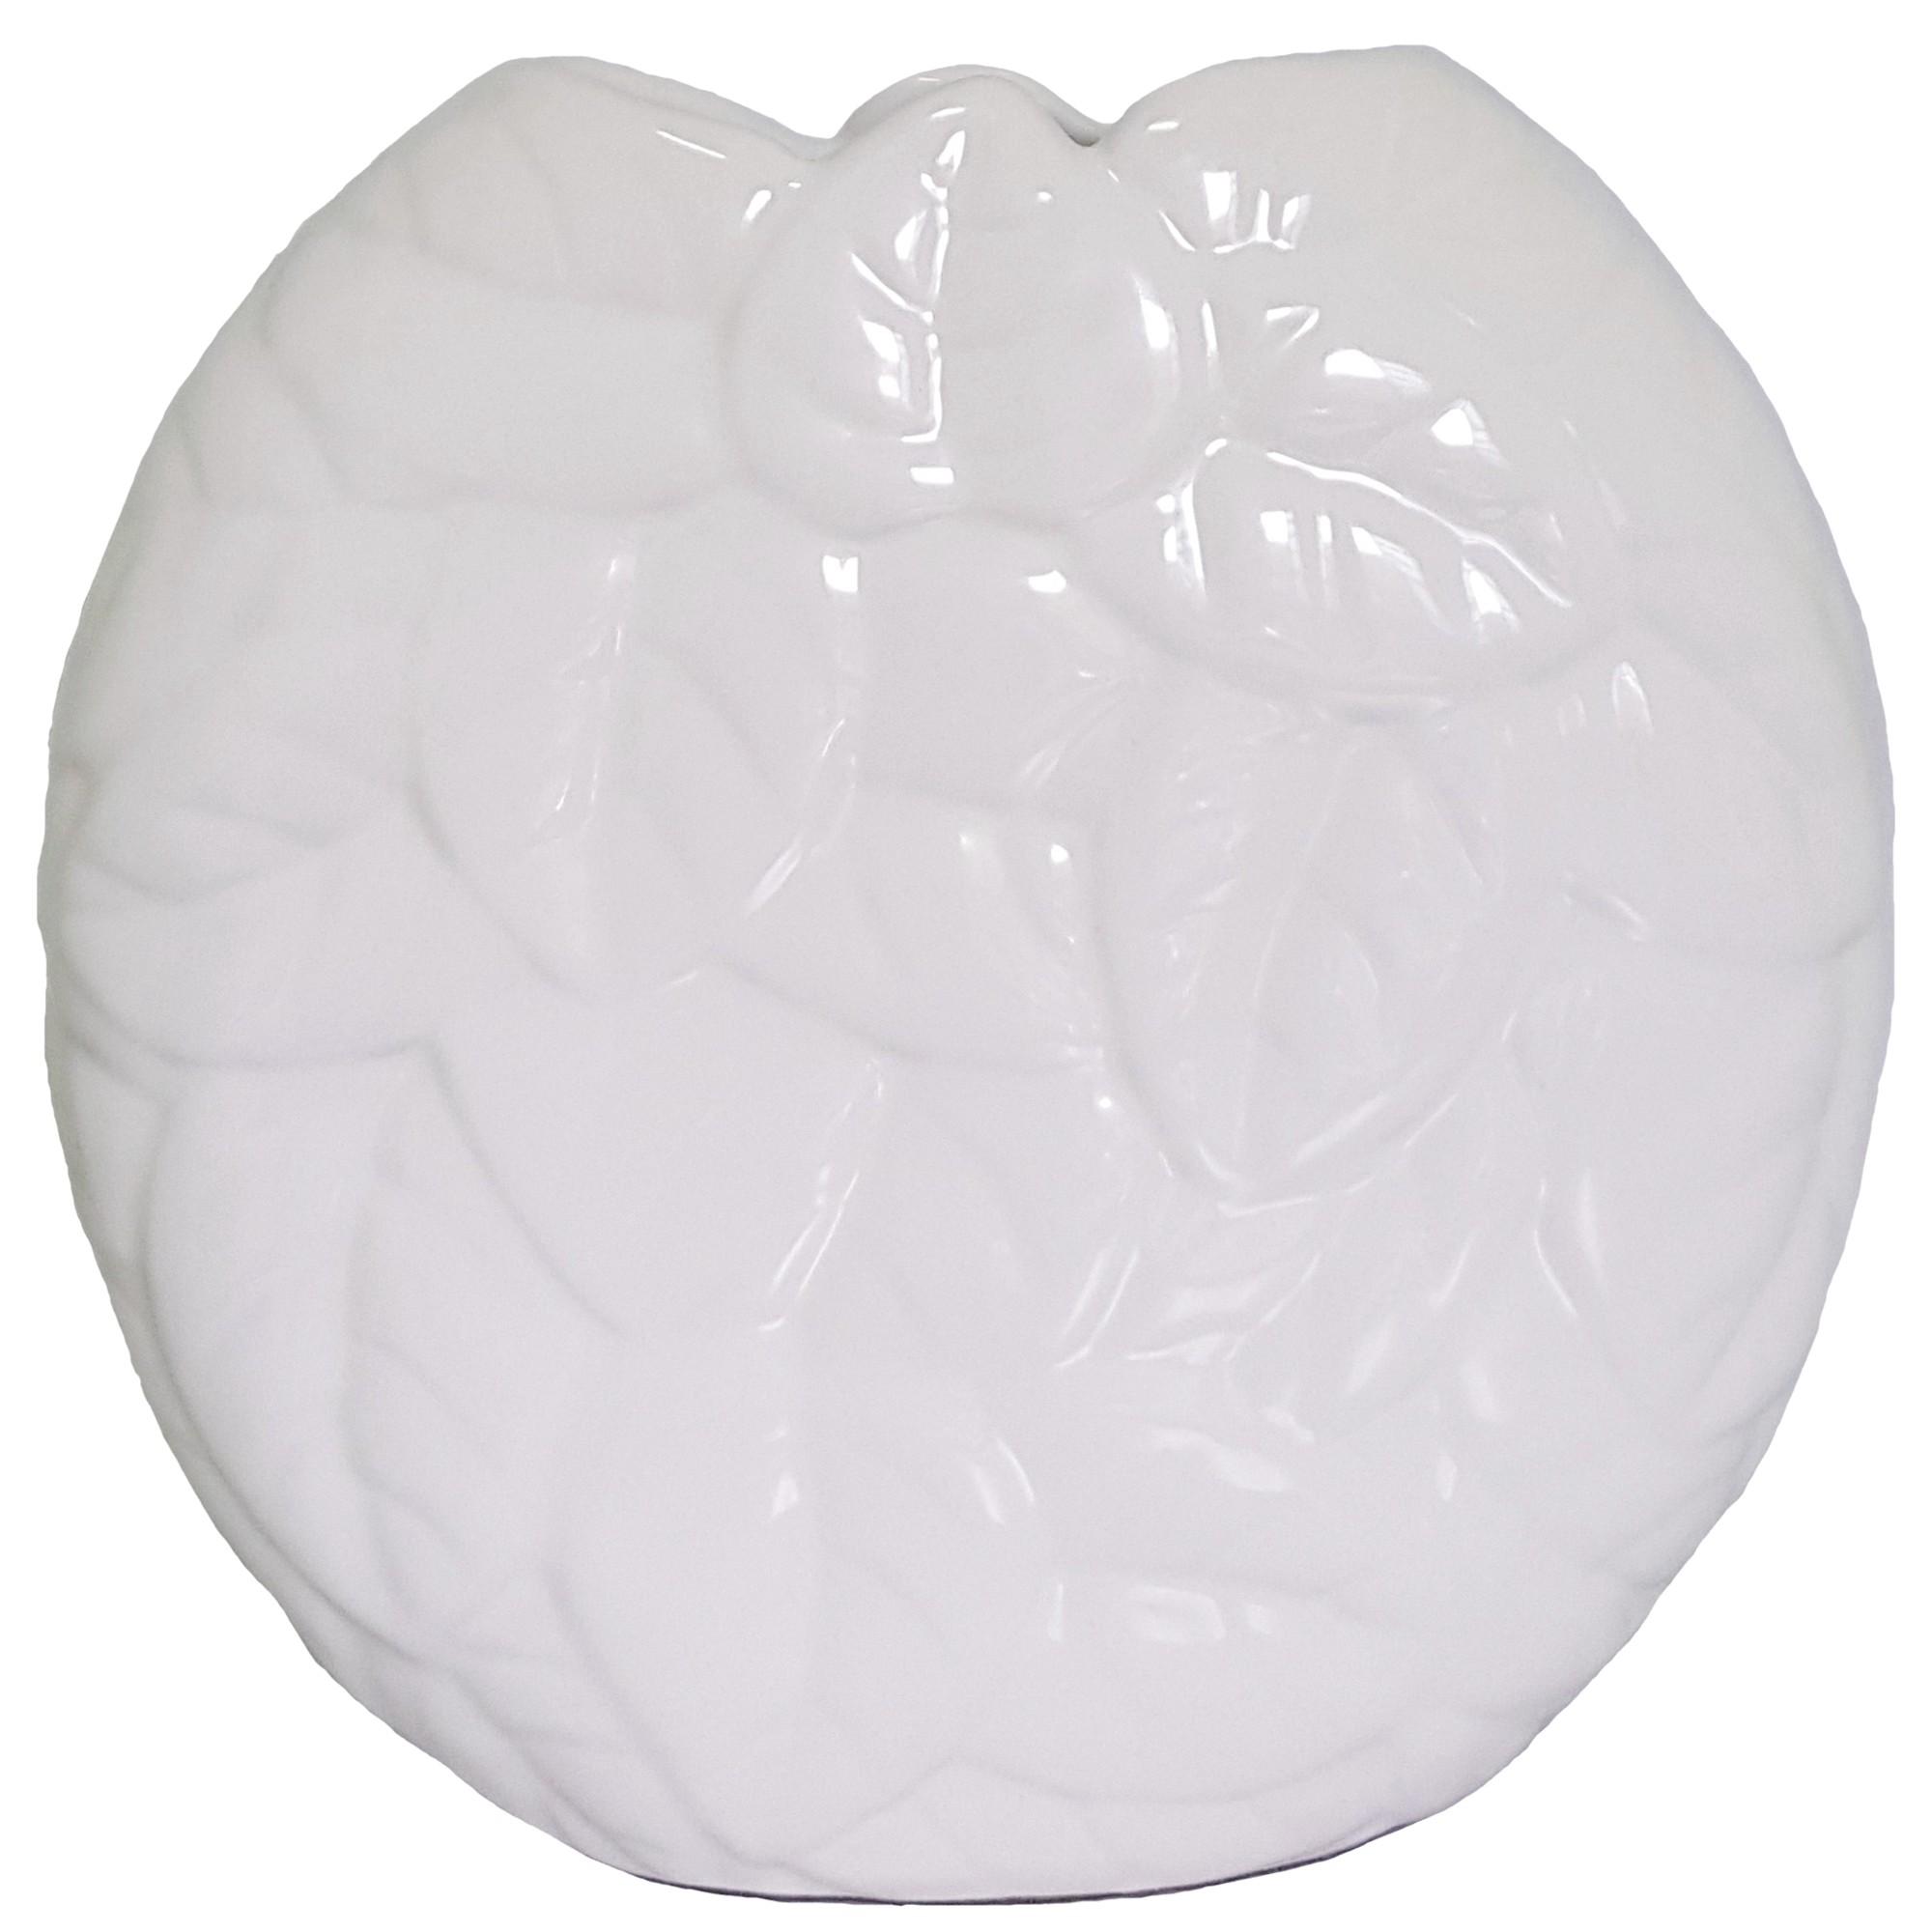 Vaso Decorativo de Ceramica Chaton Folhas 26 cm 89504 - Buzzio s